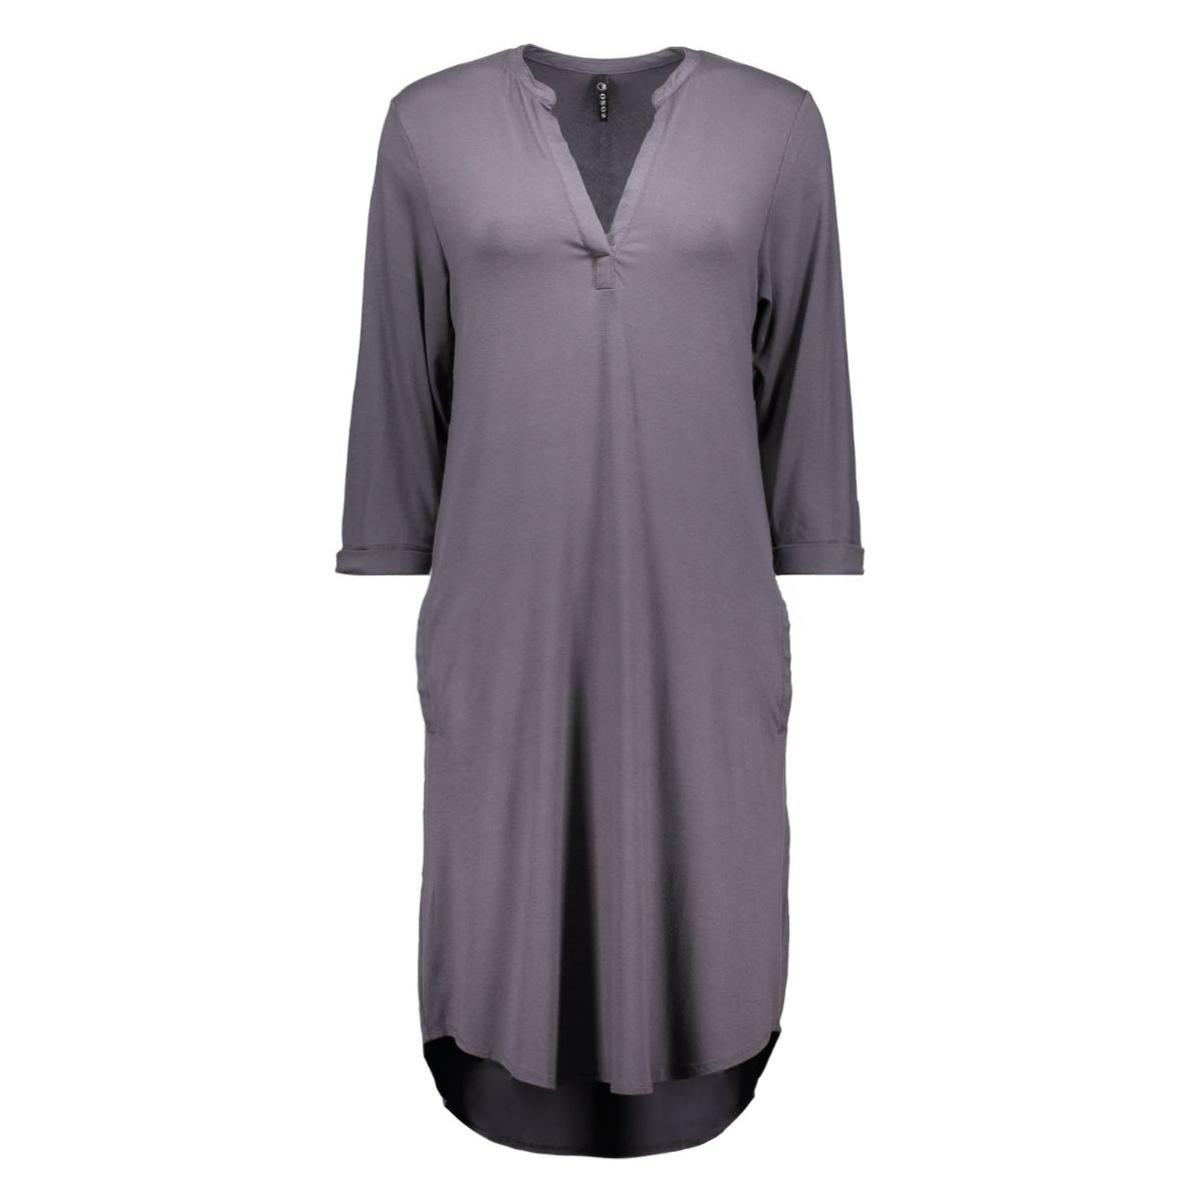 angelique zoso jurk grey